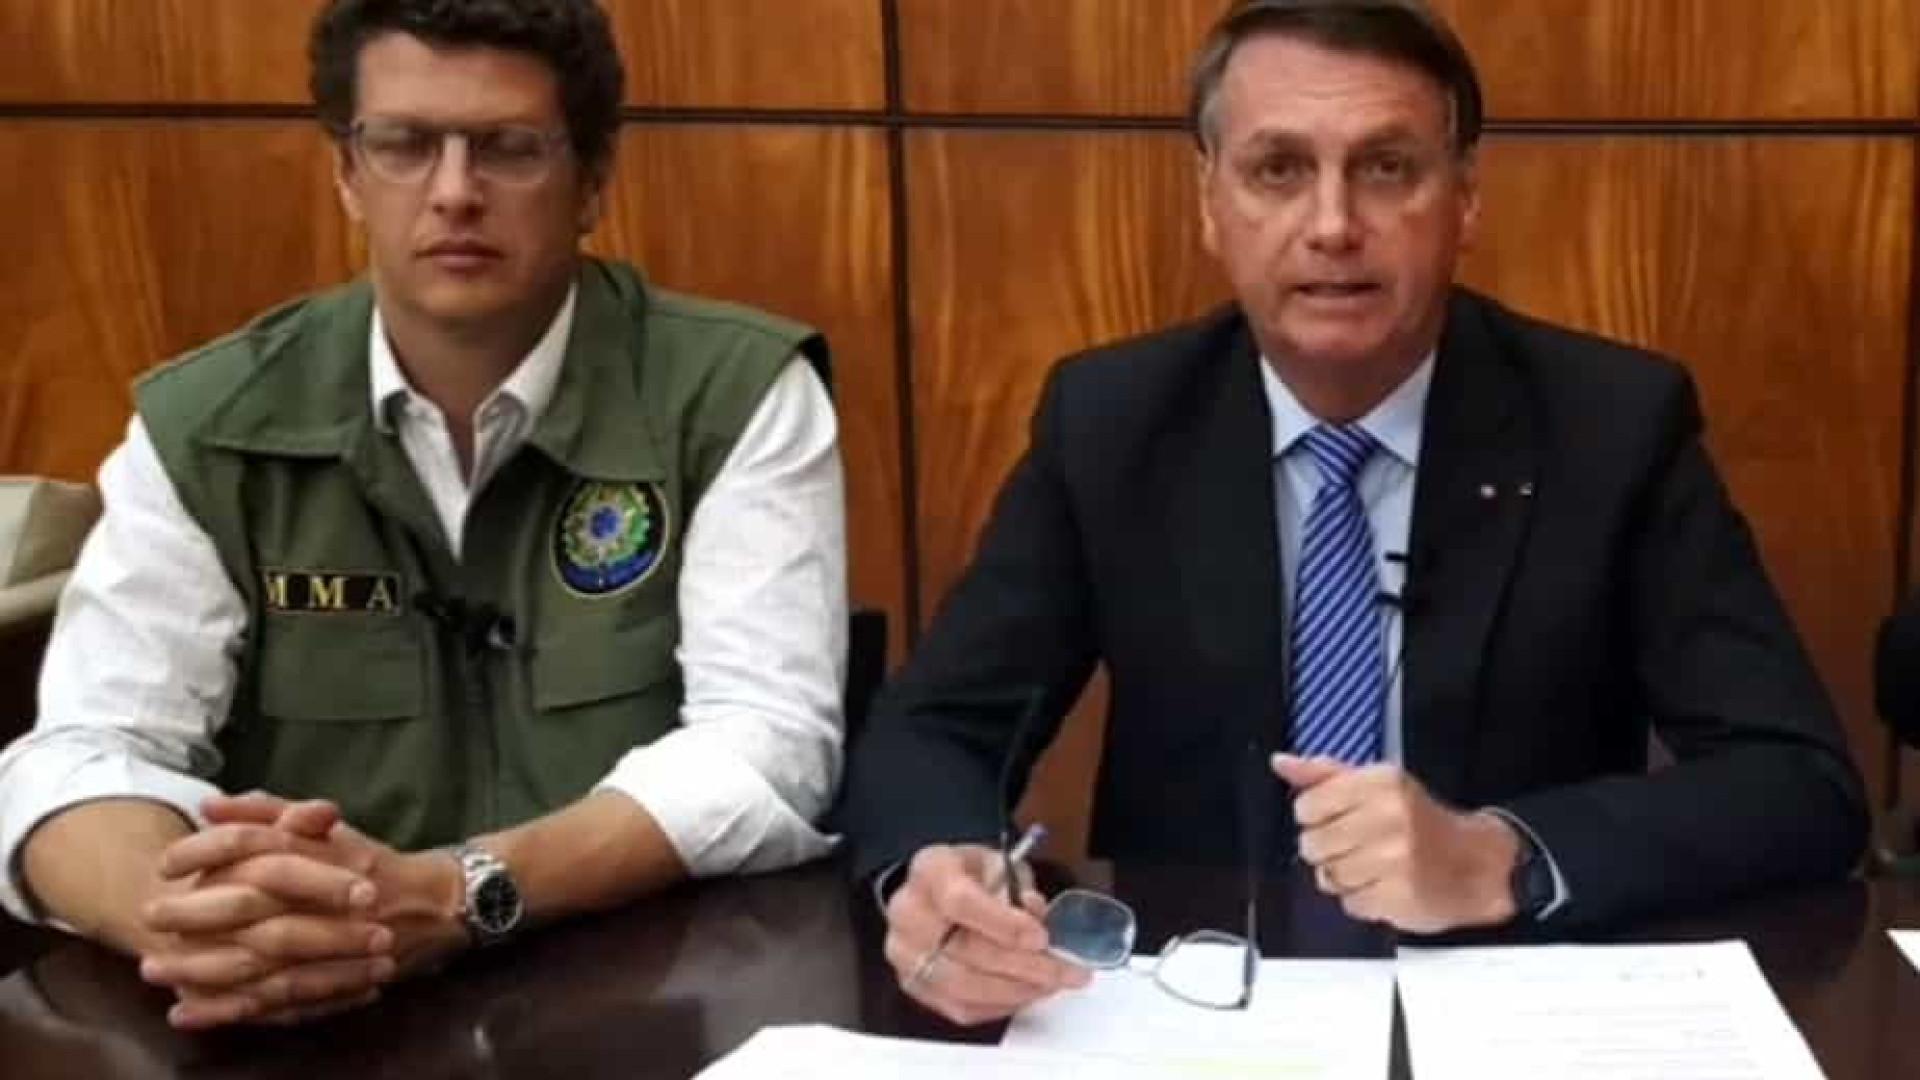 Ao lado de Salles, Bolsonaro repete que o Brasil é 'o país que mais preserva'